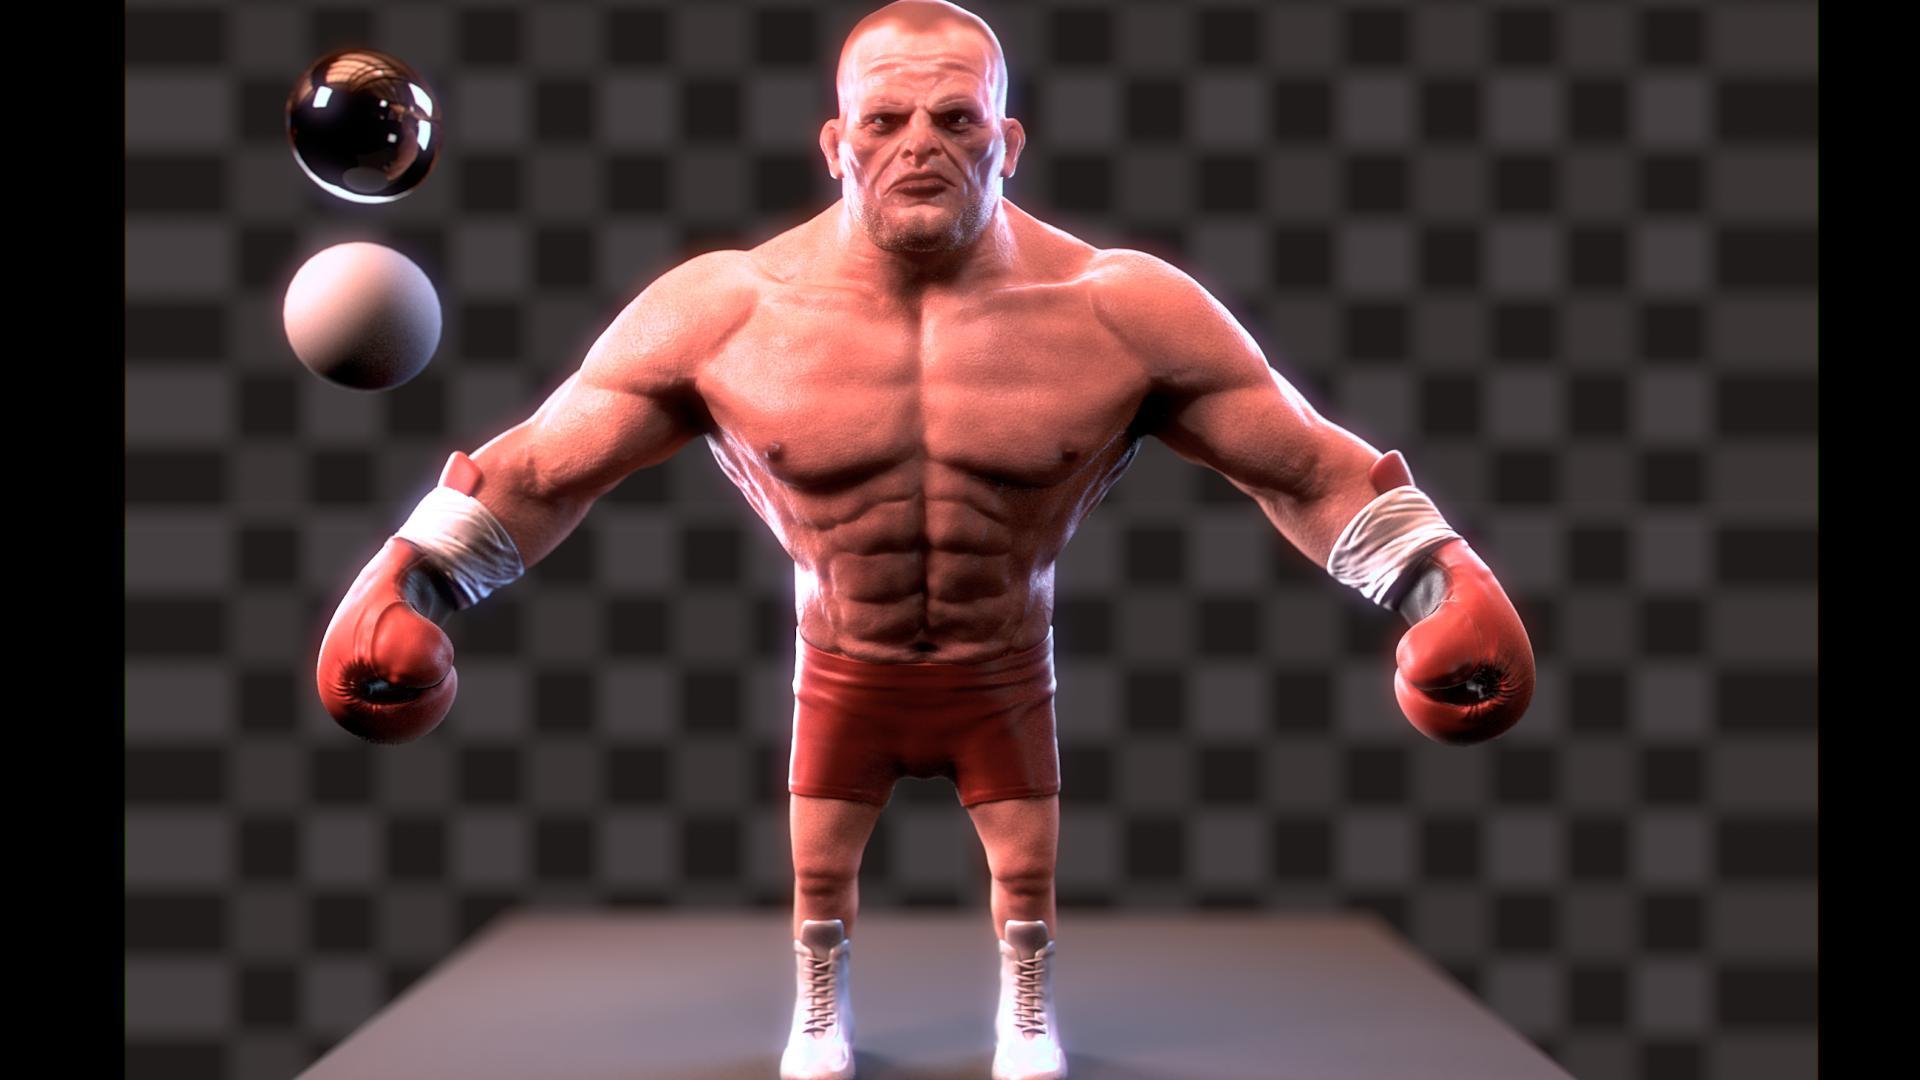 Boxeur_02.jpg